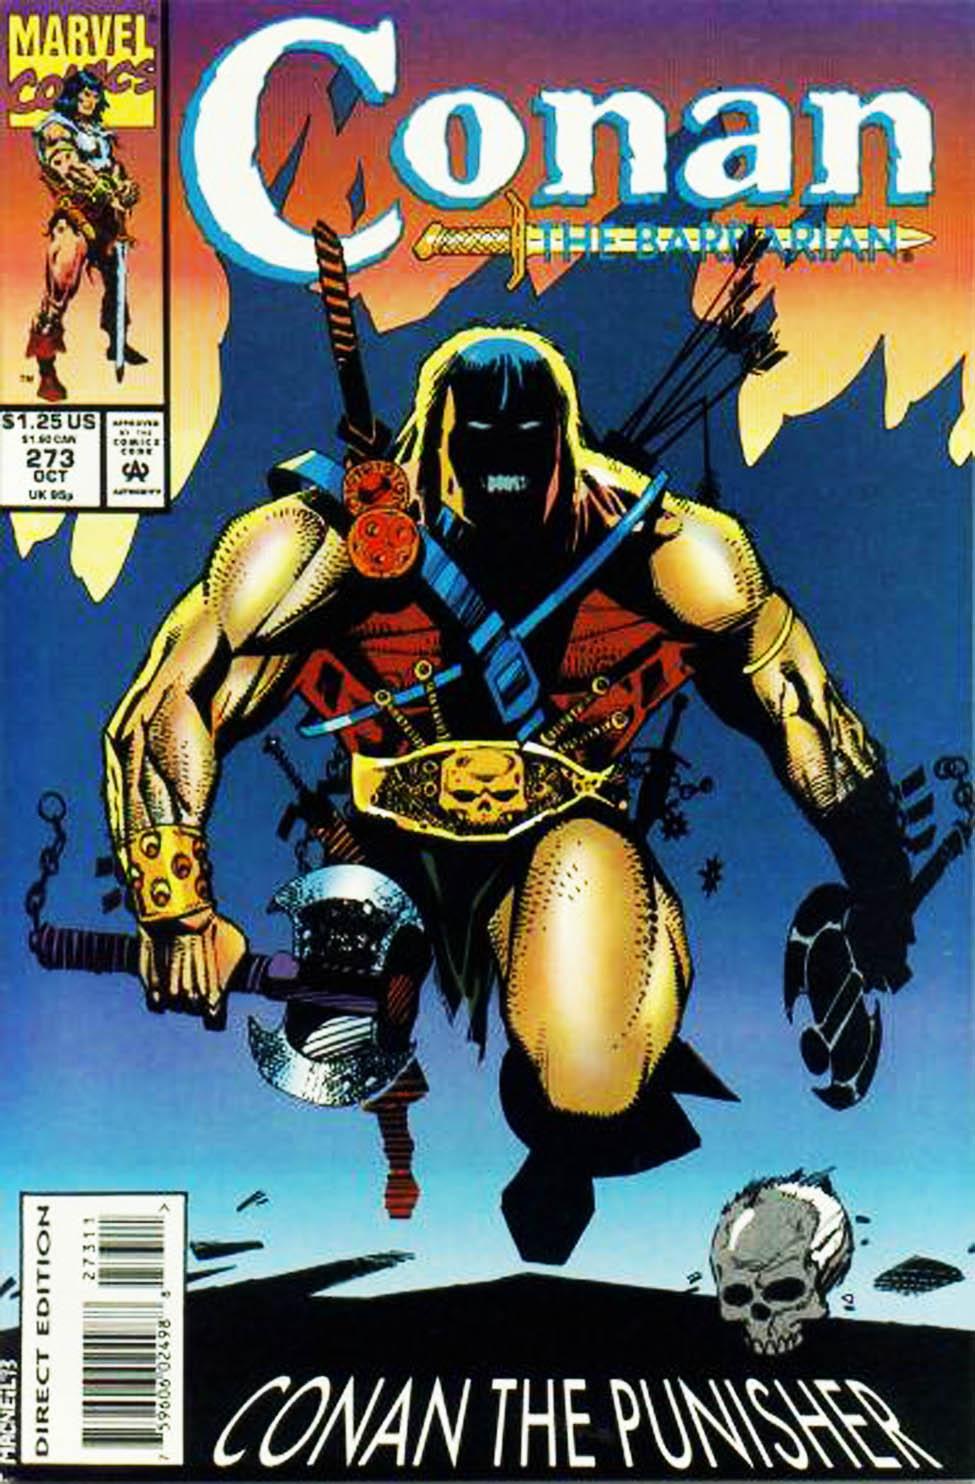 Conan the Barbarian 273